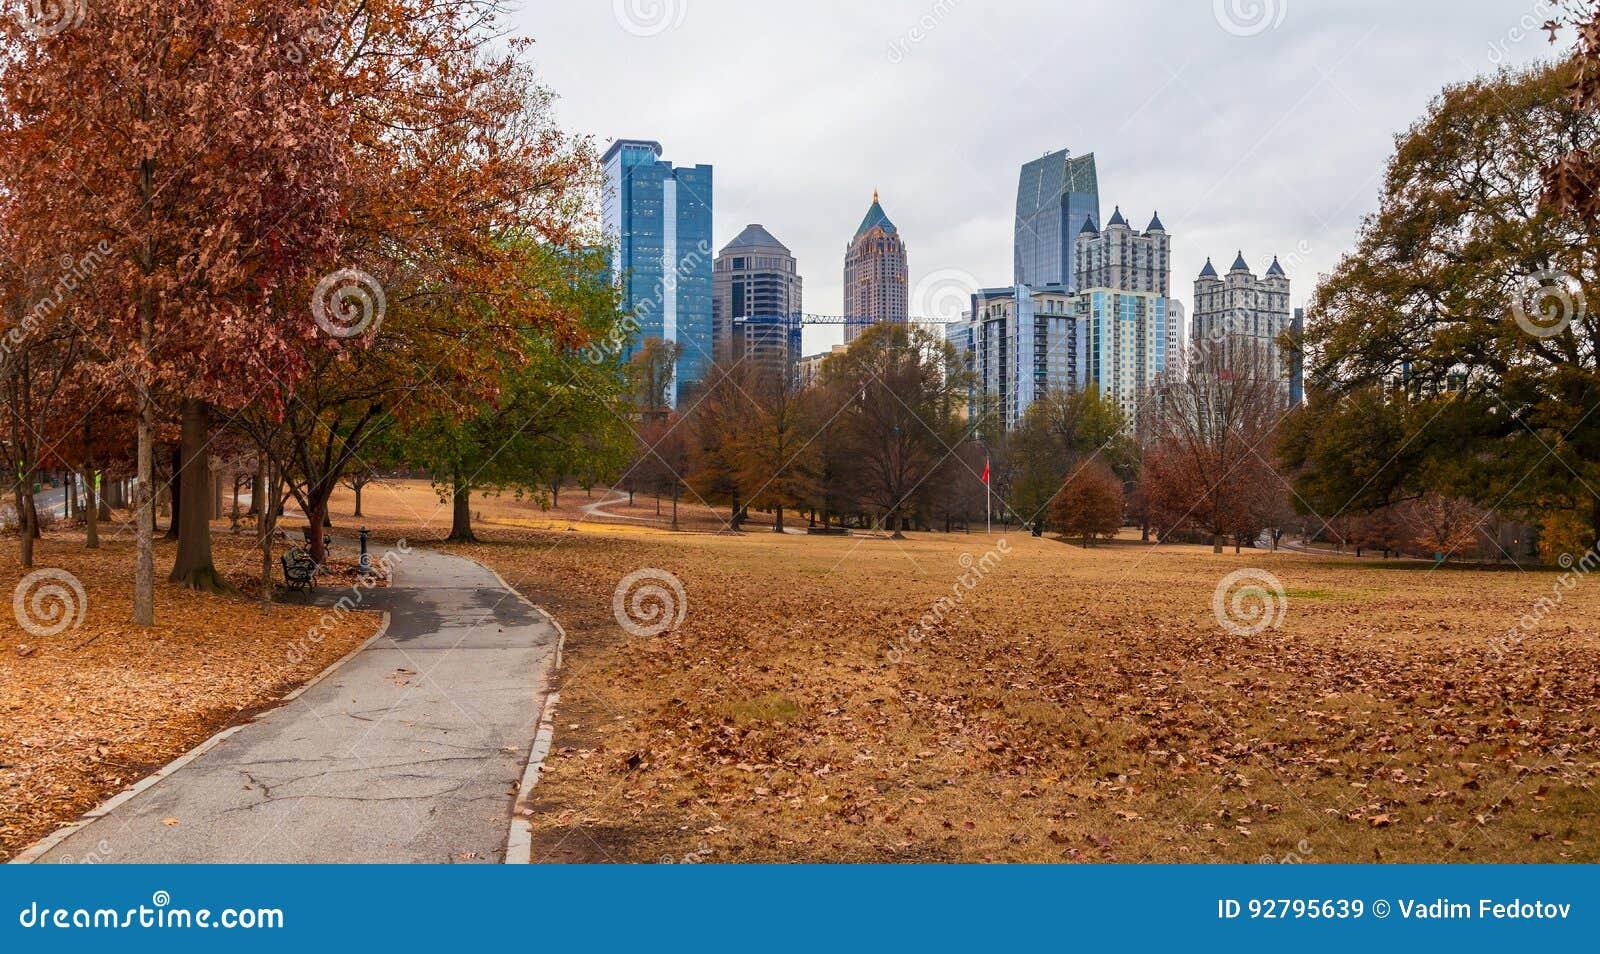 Midtown Atlanta And Oak Hill In Piedmont Park, USA Stock